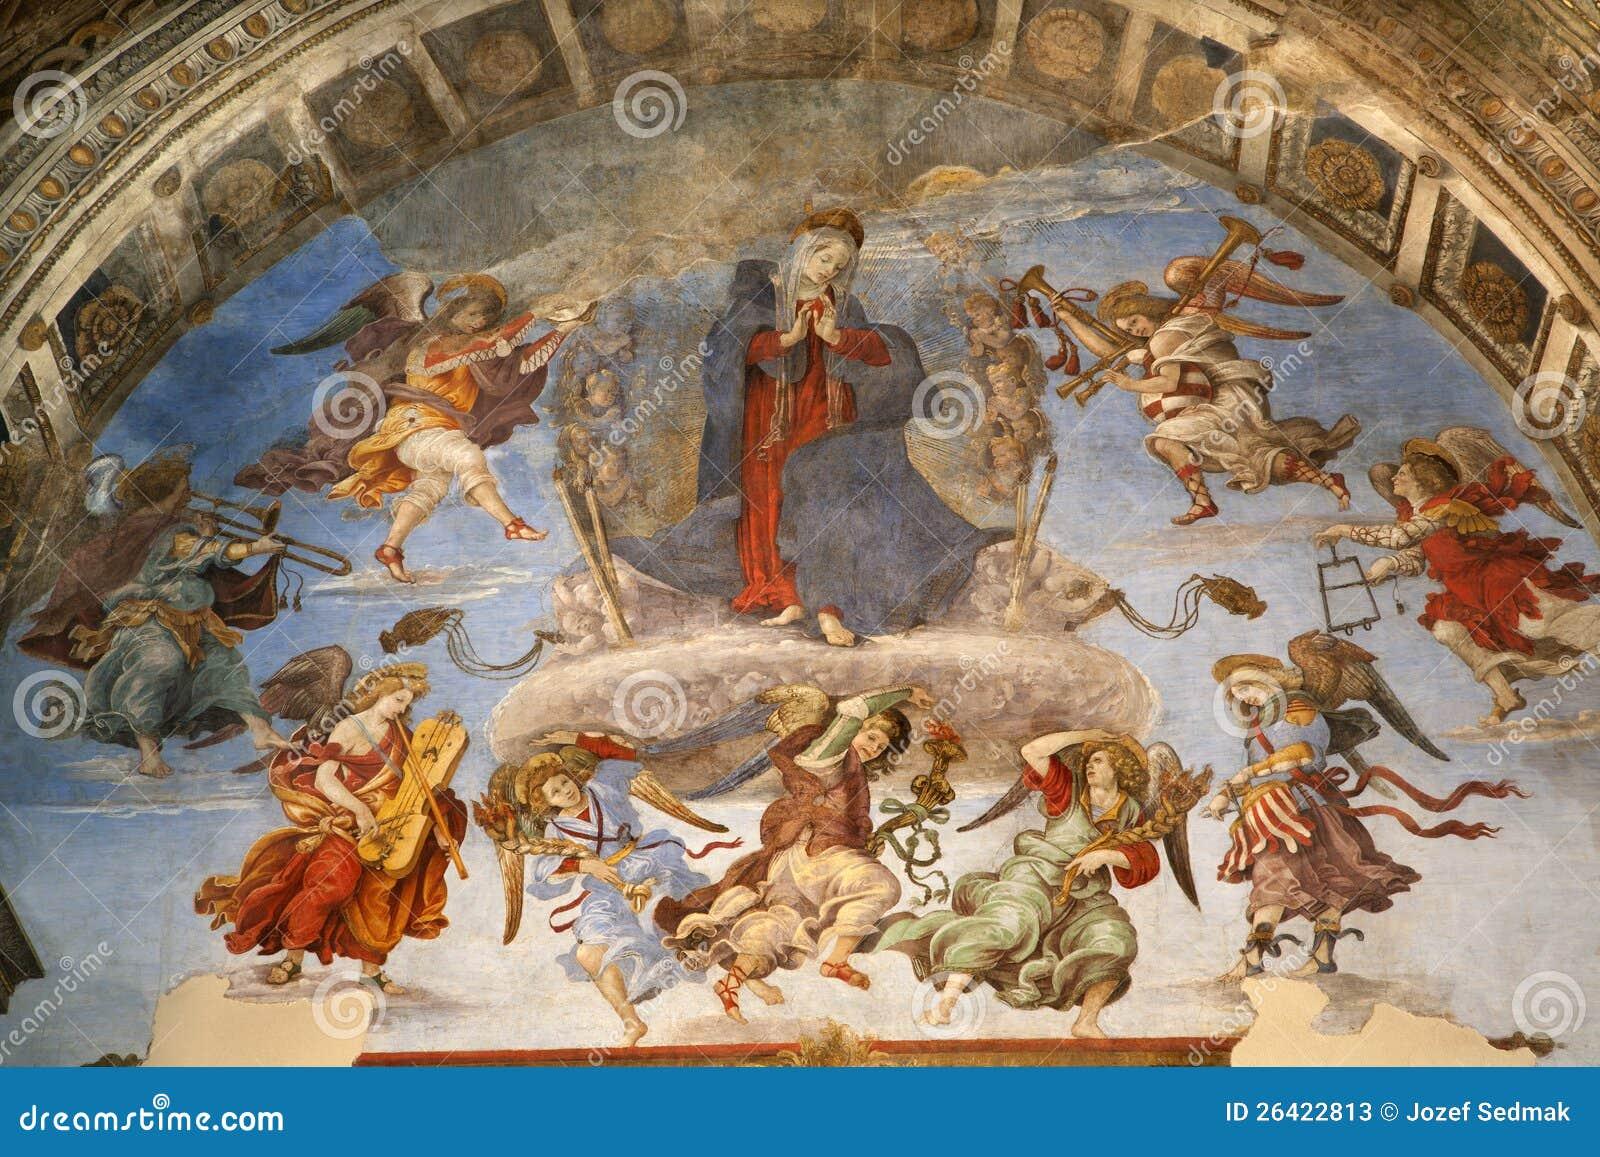 When In Rome - Heaven Knows